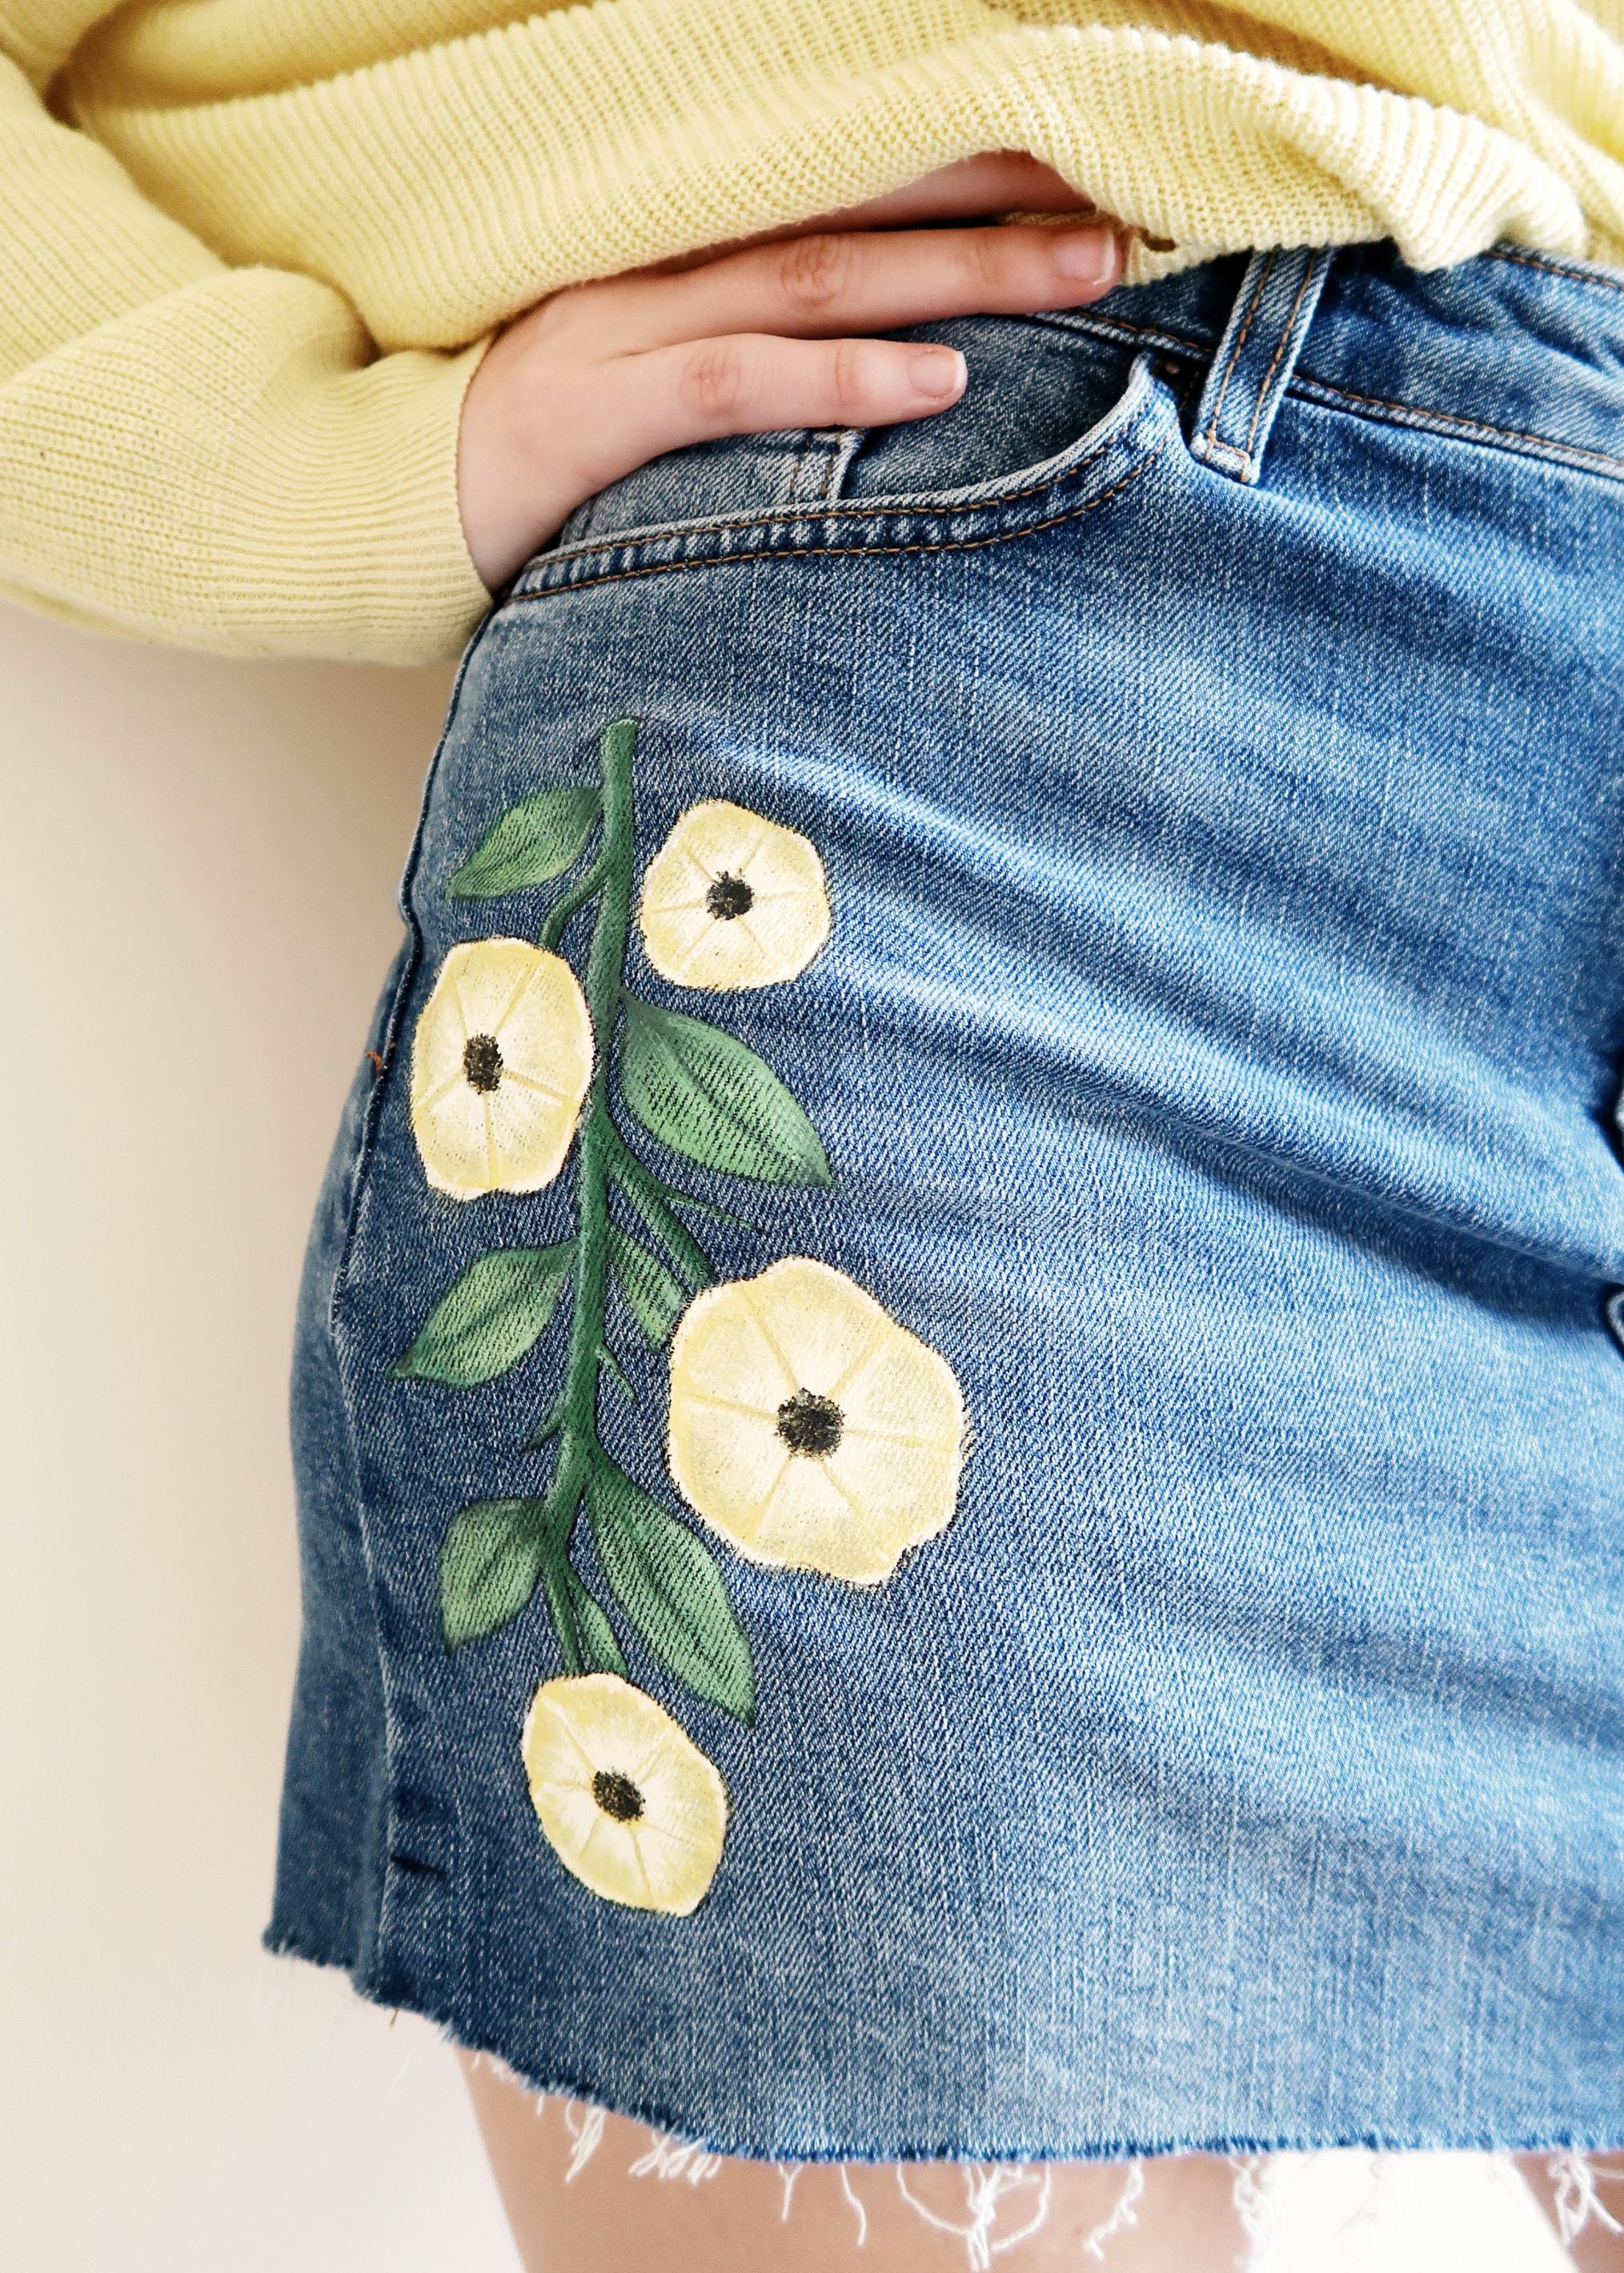 DIY Topshop Inspired Denim Skirt by Isoscella